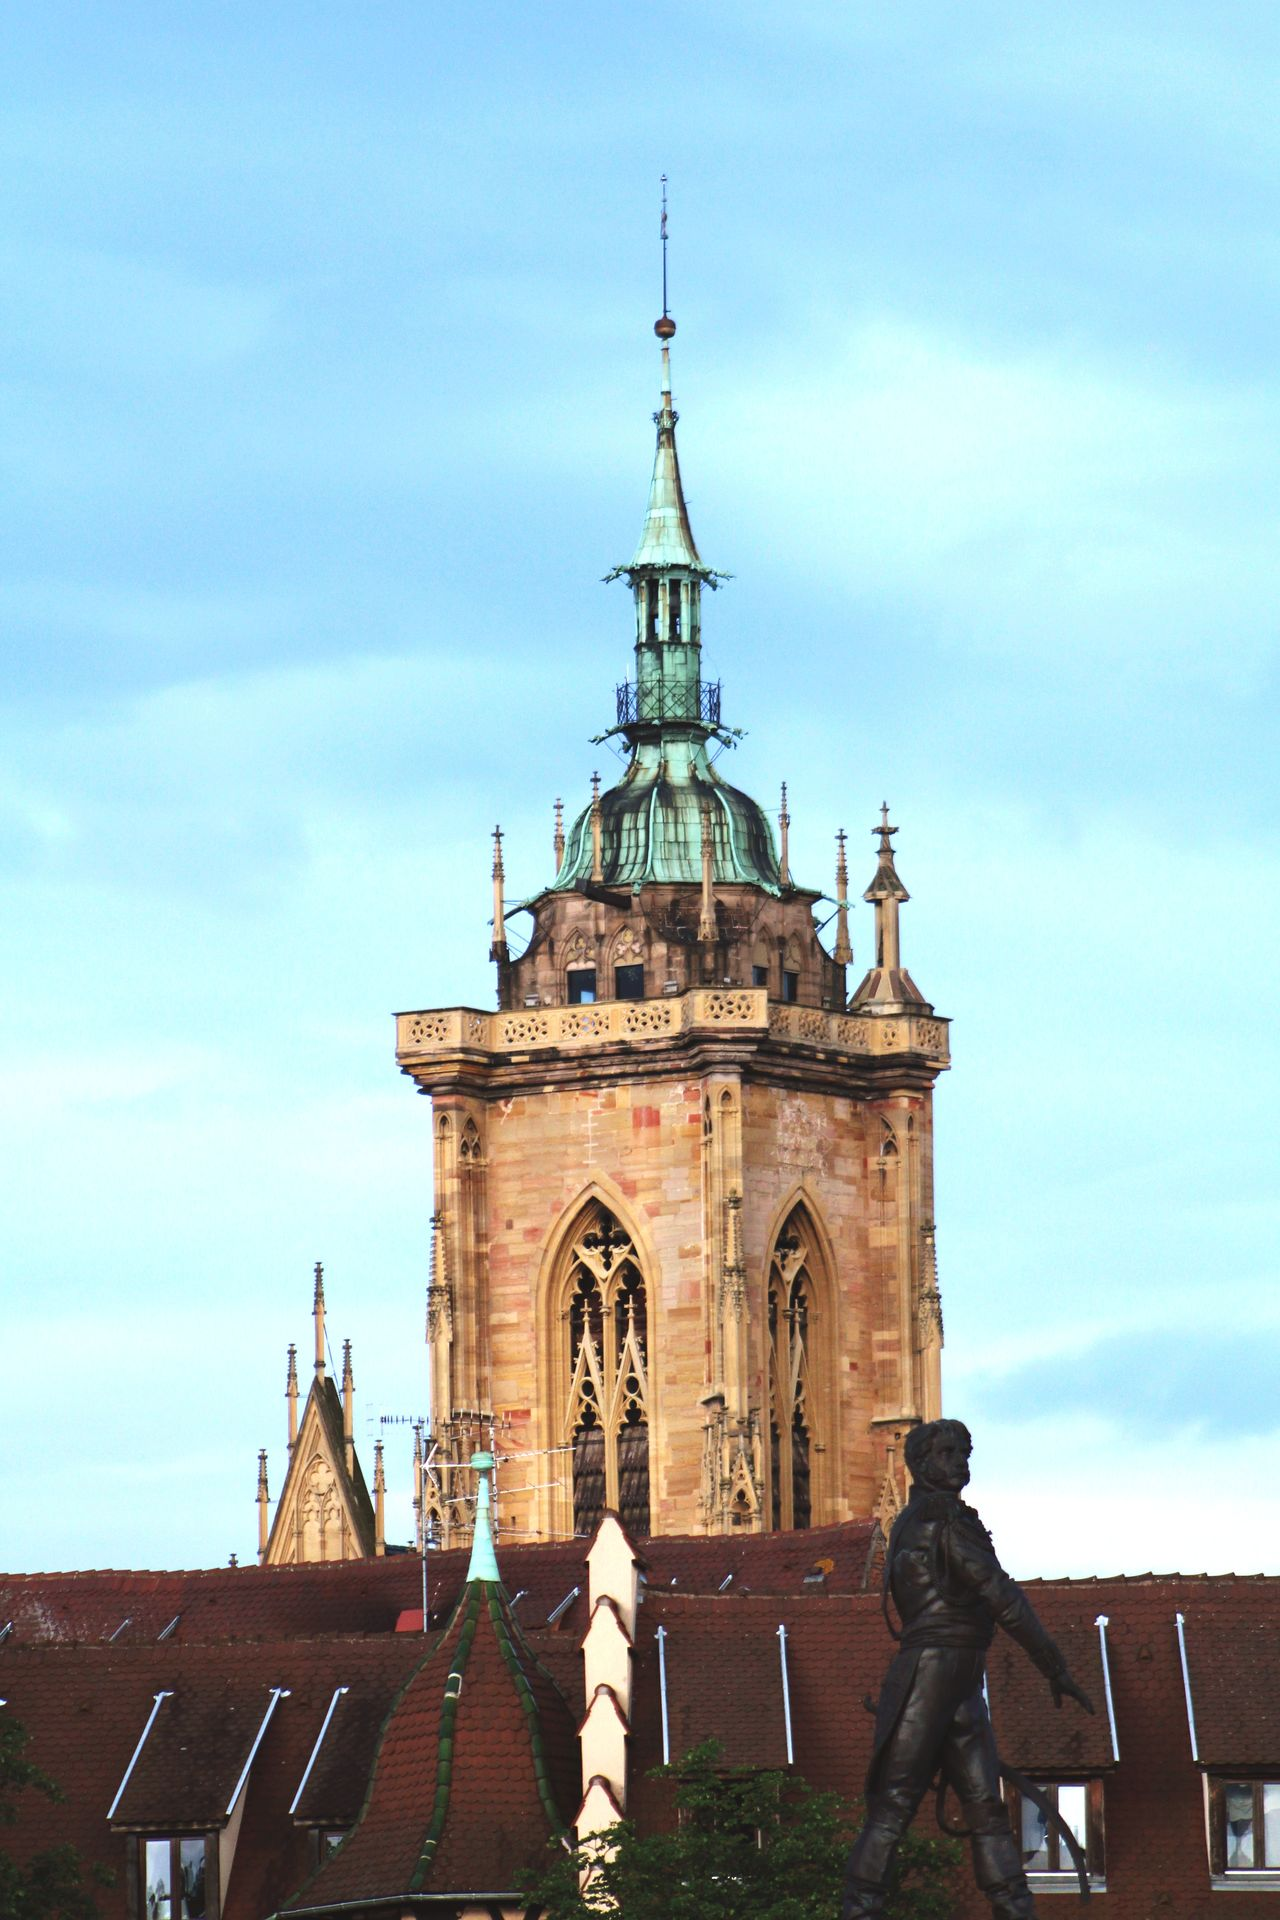 Architecture Travel Destinations Travel City Tower No People Cloud - Sky Colmar, Alsace, France